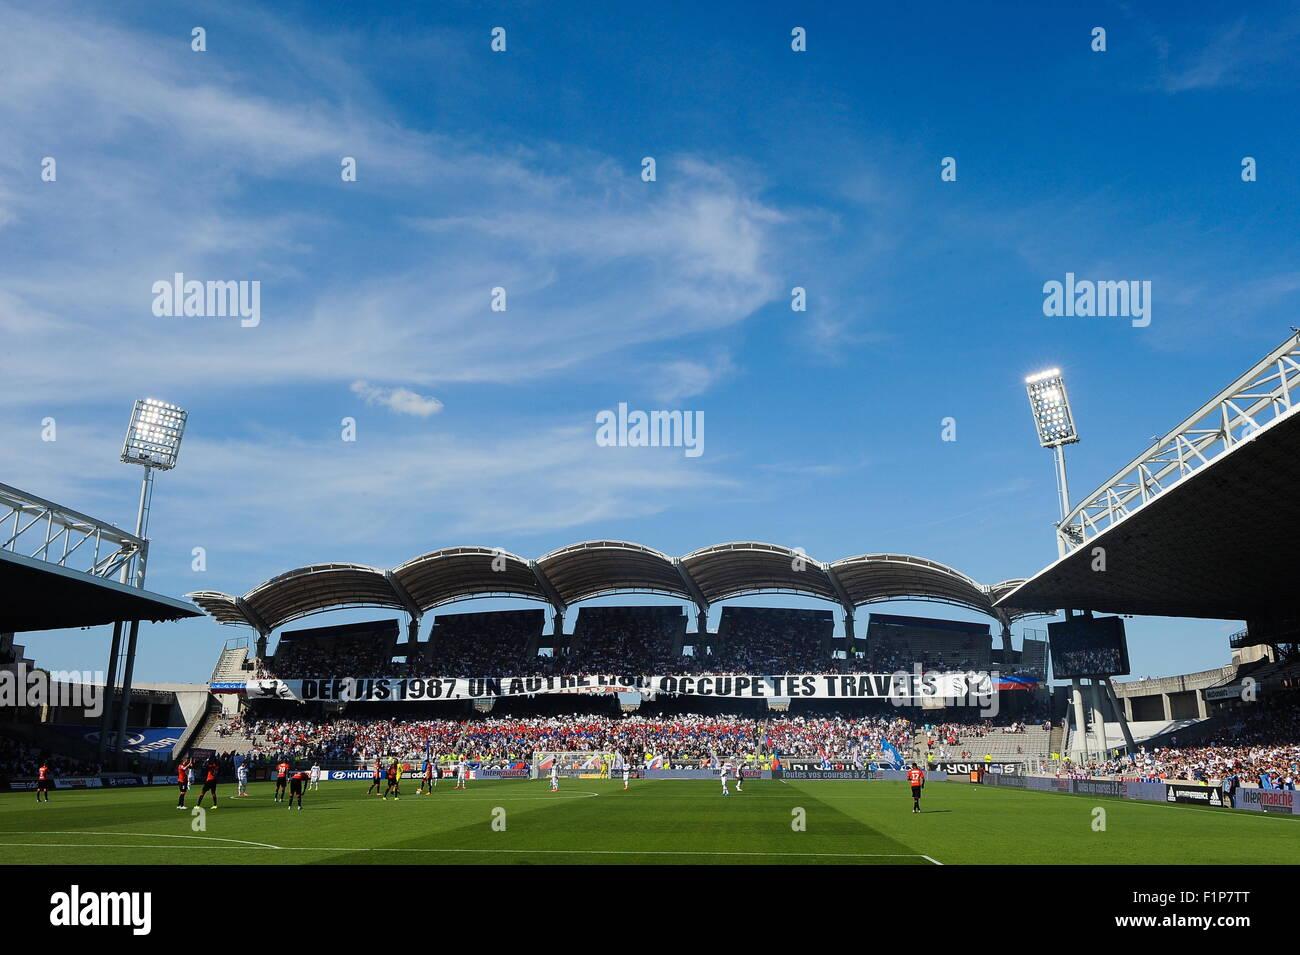 Stade Gerland - 22.08.2015 - Lyon/Rennes - 3eme journee de Ligue 1.Photo : Jean Paul Thomas/Icon Sport Stock Photo